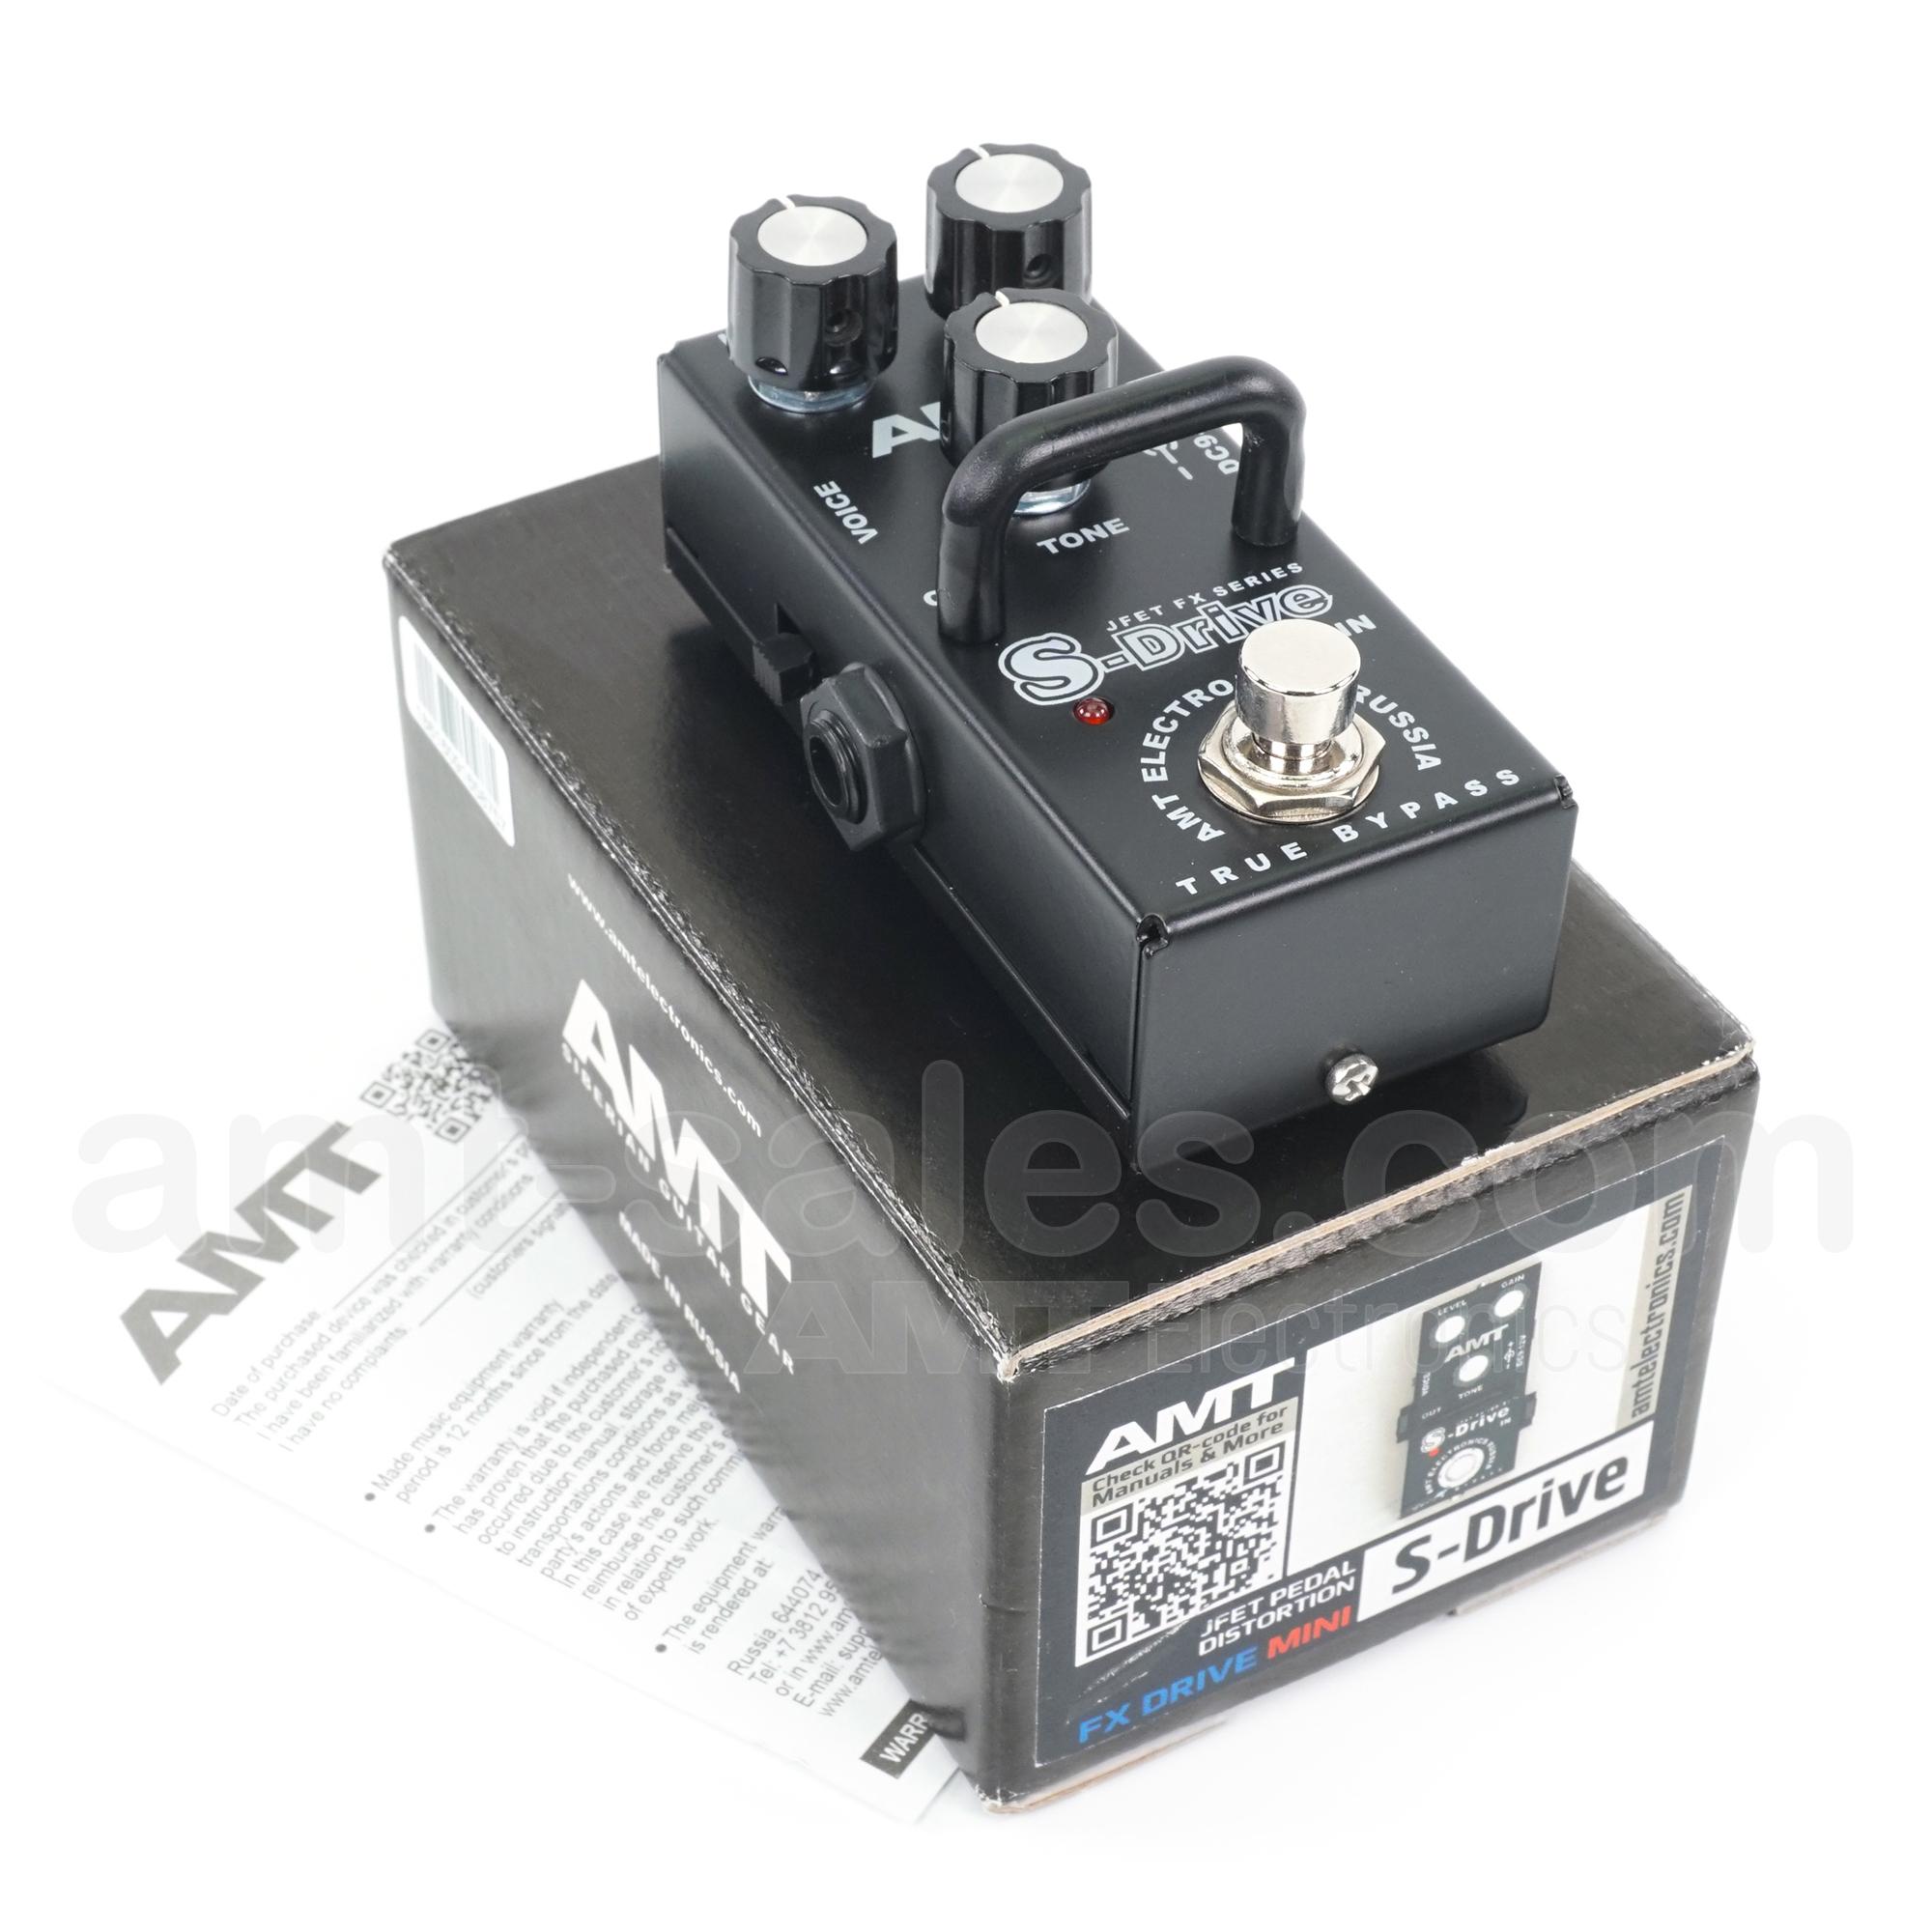 AMT S-Drive mini (Soldano)